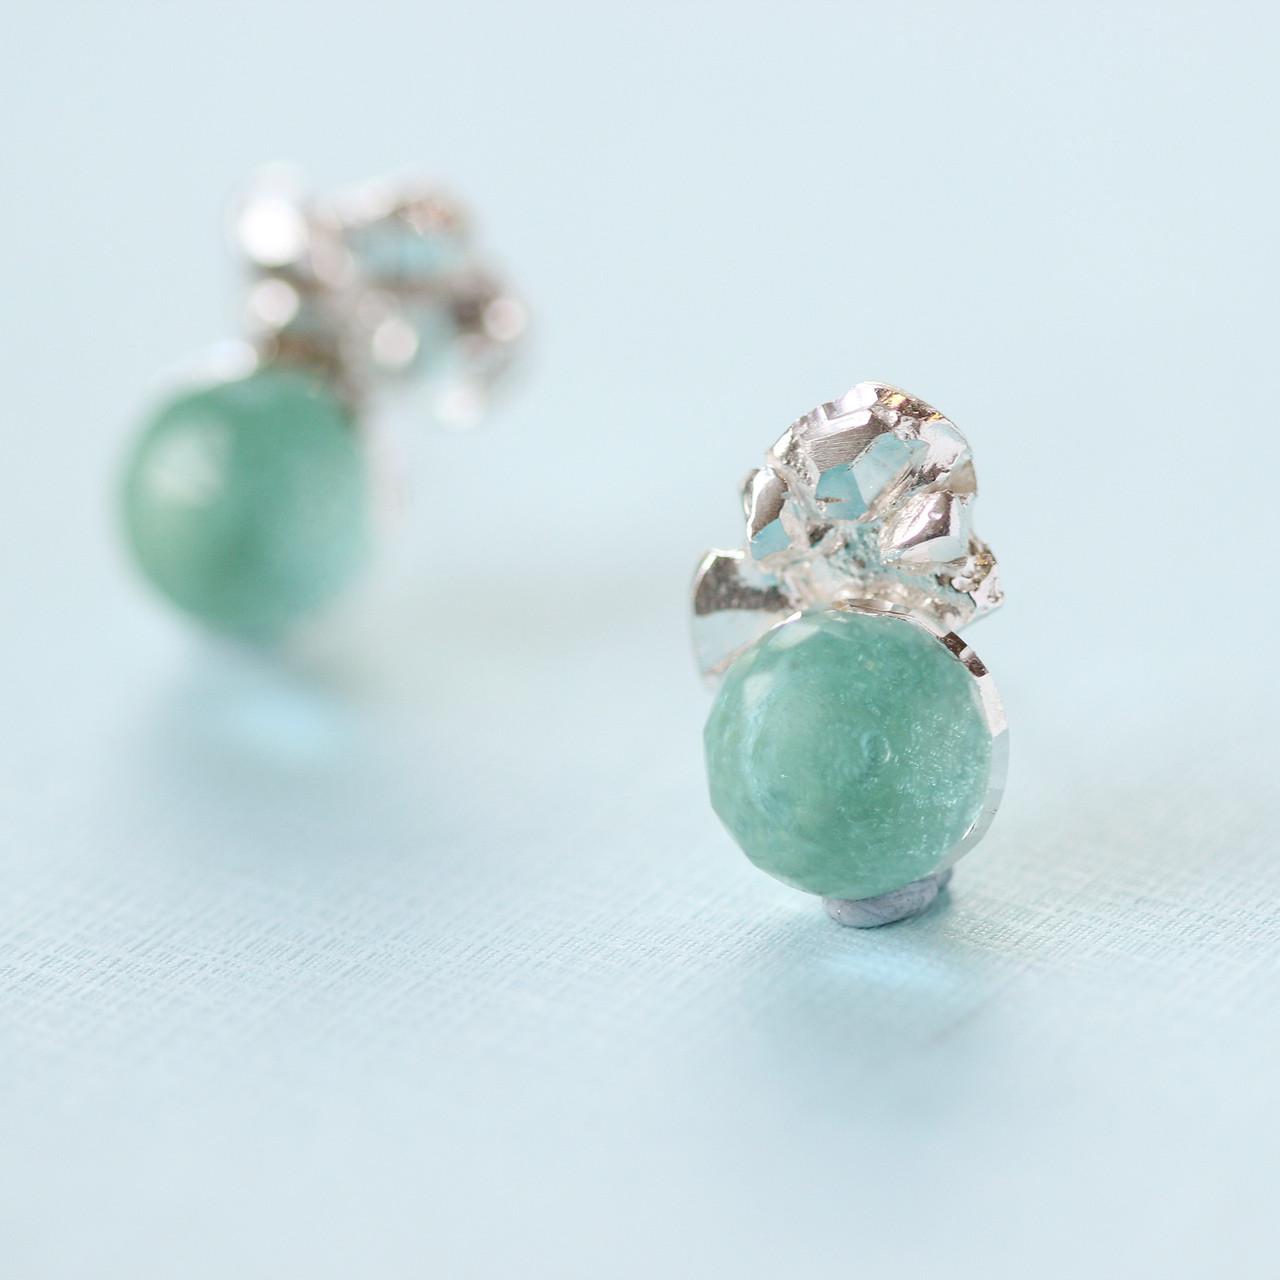 2be358eea Loading zoom. Tina Kotsoni - Sterling Silver and Green Gemstone Earrings